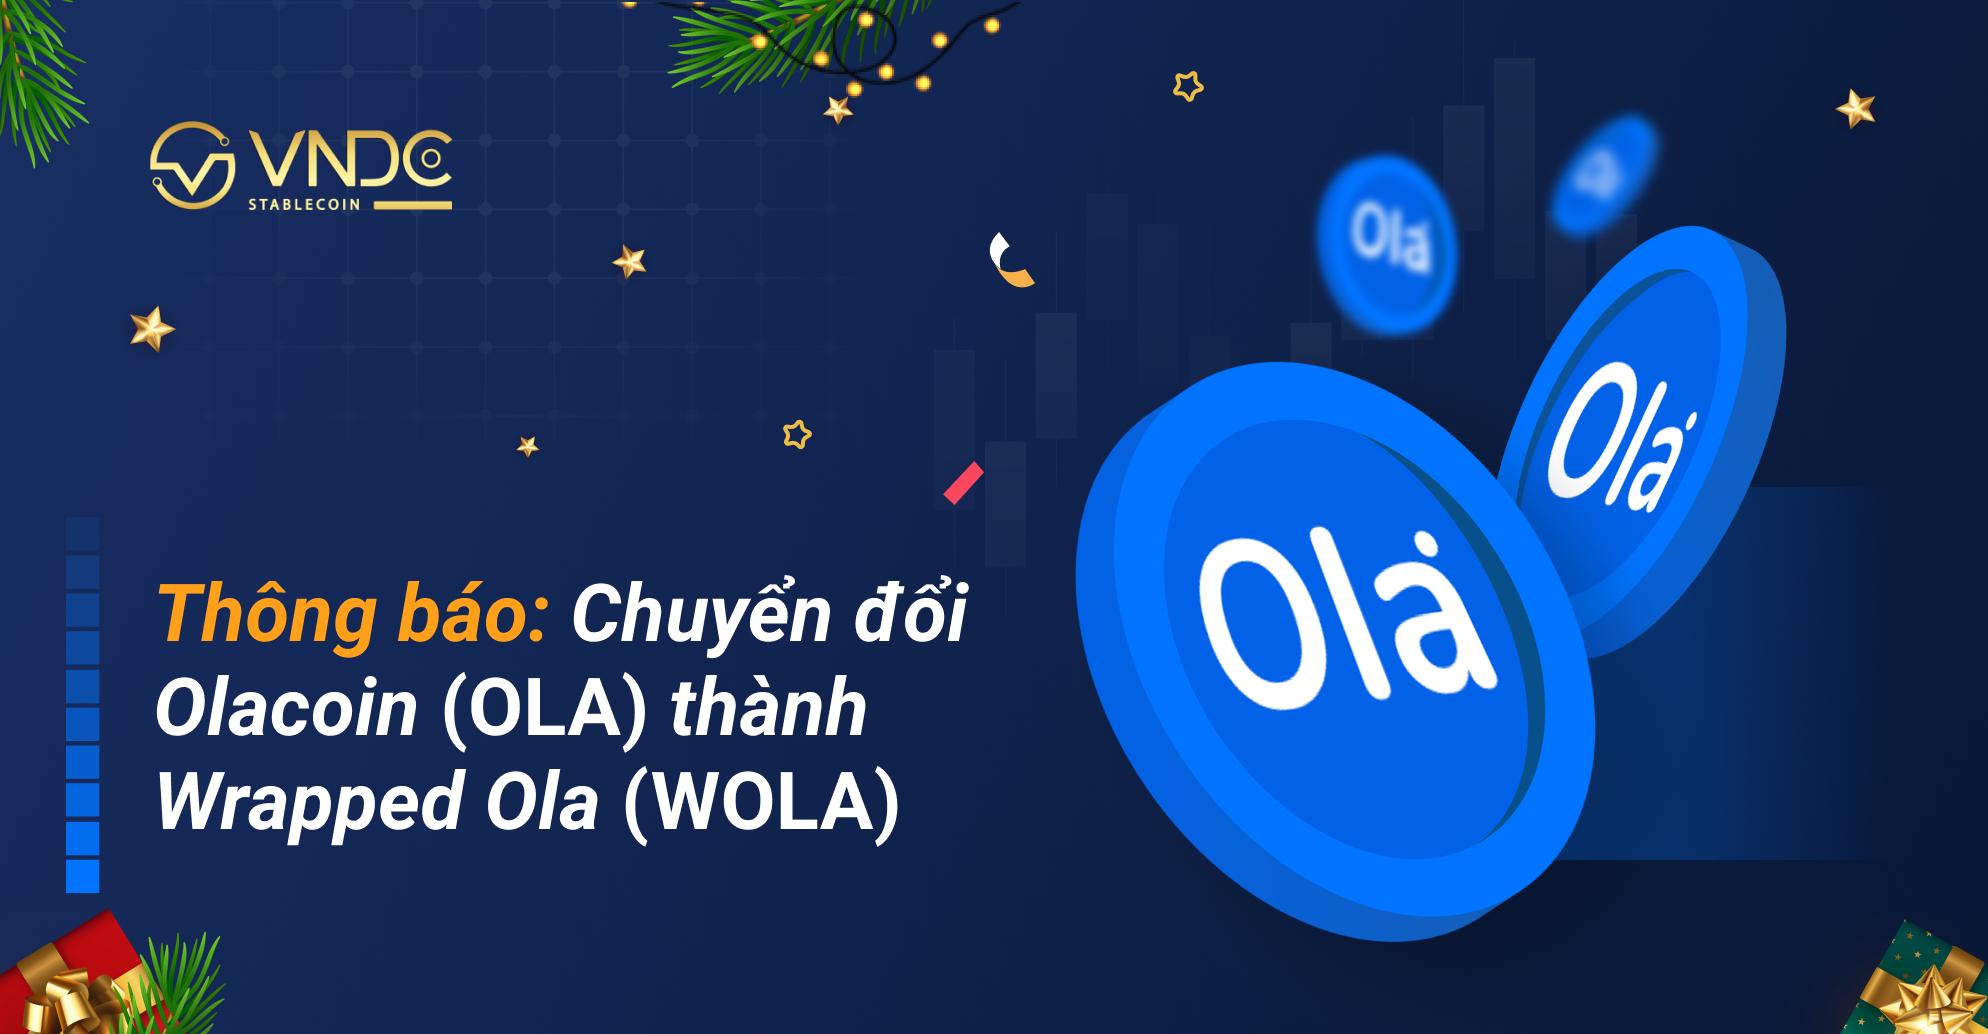 Thông báo: Chuyển đổi Olacoin (OLA) thành Wrapped Ola (WOLA)